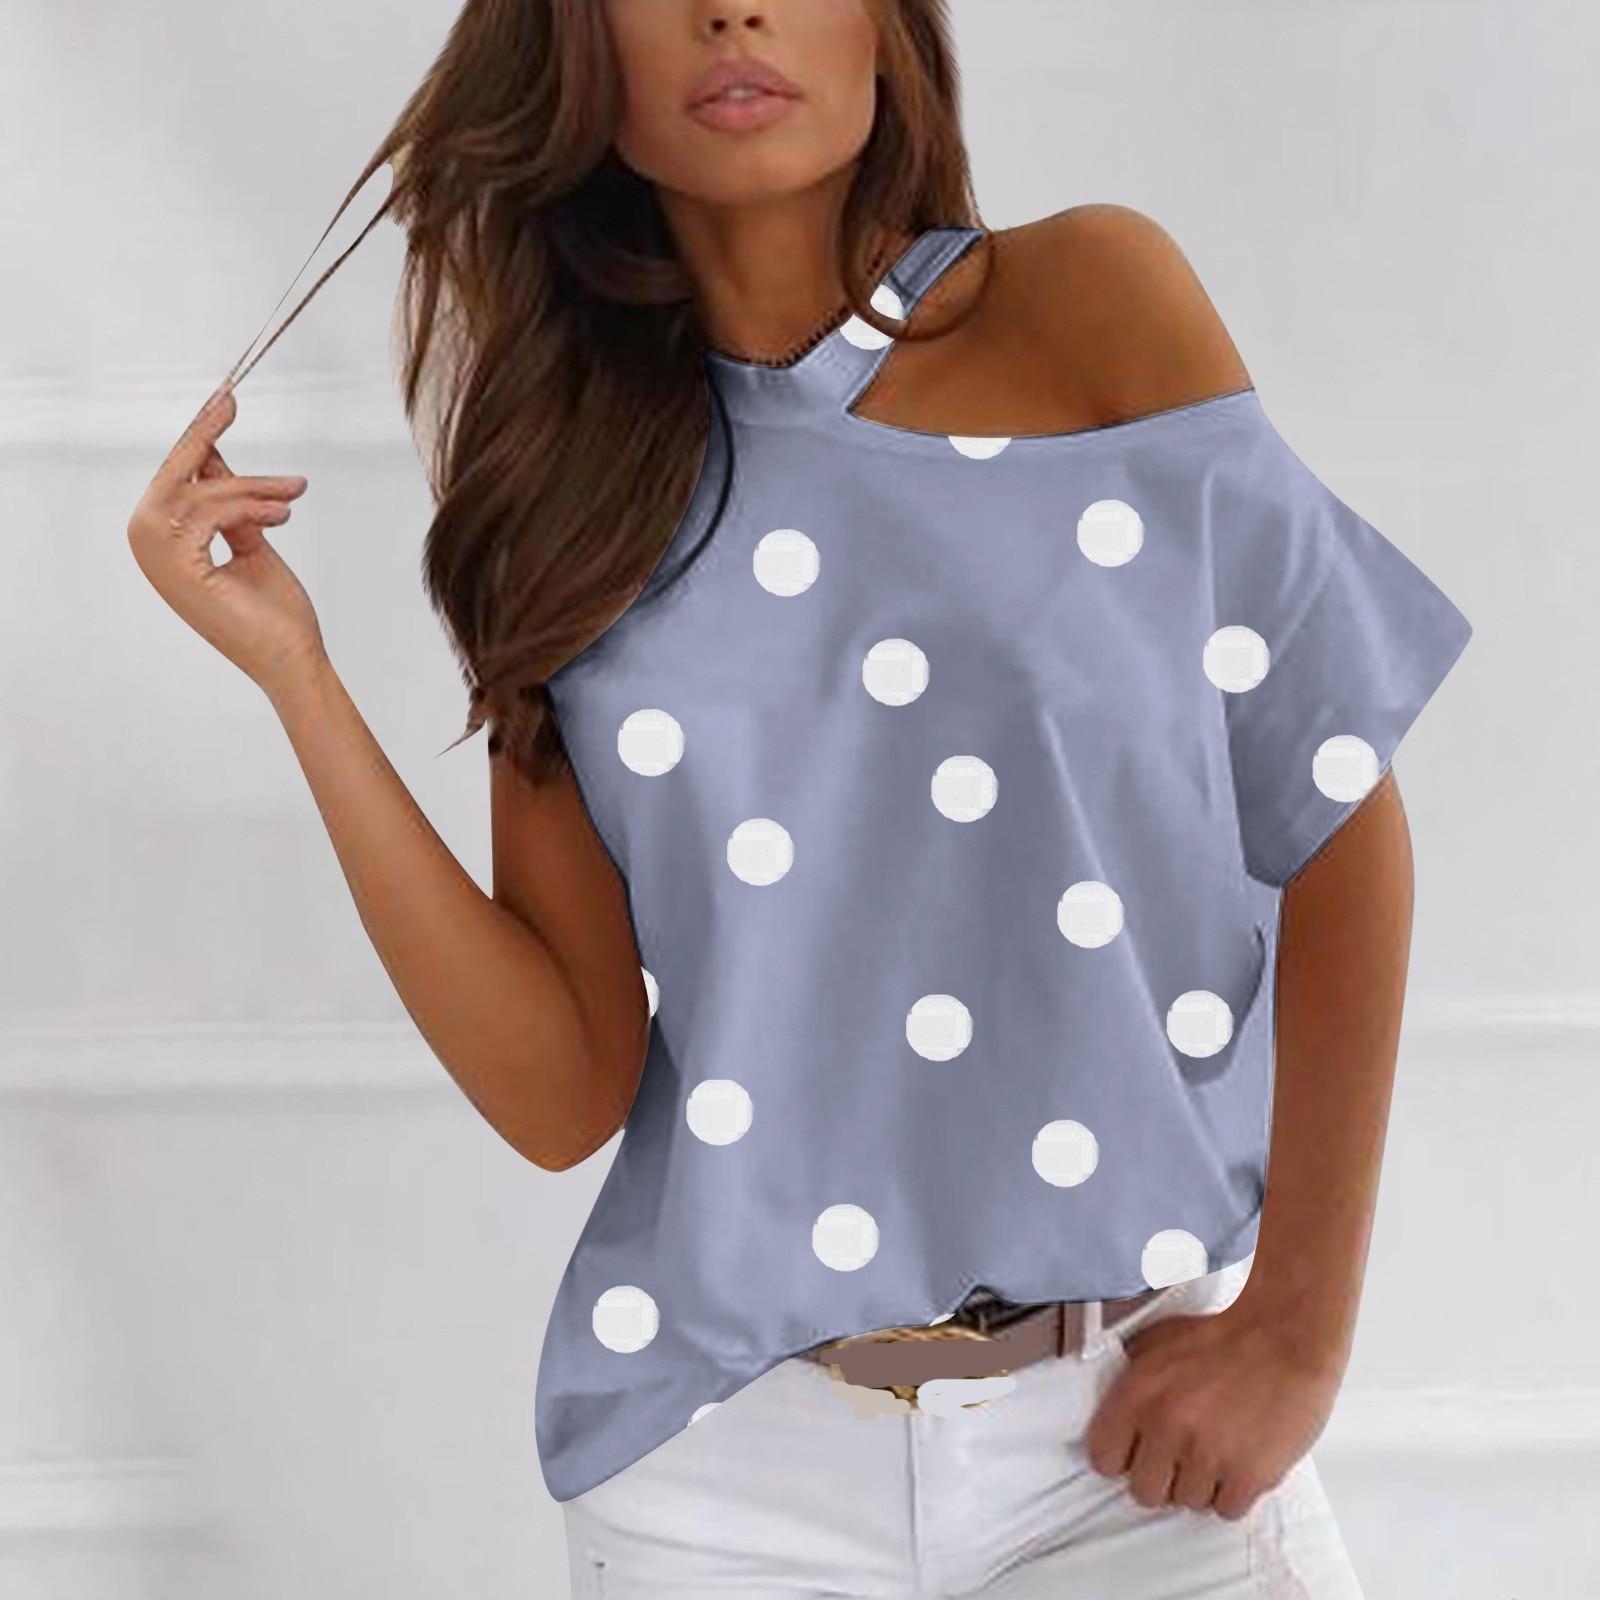 De moda de dibujo de lunares camiseta 2021 mujeres de verano de...